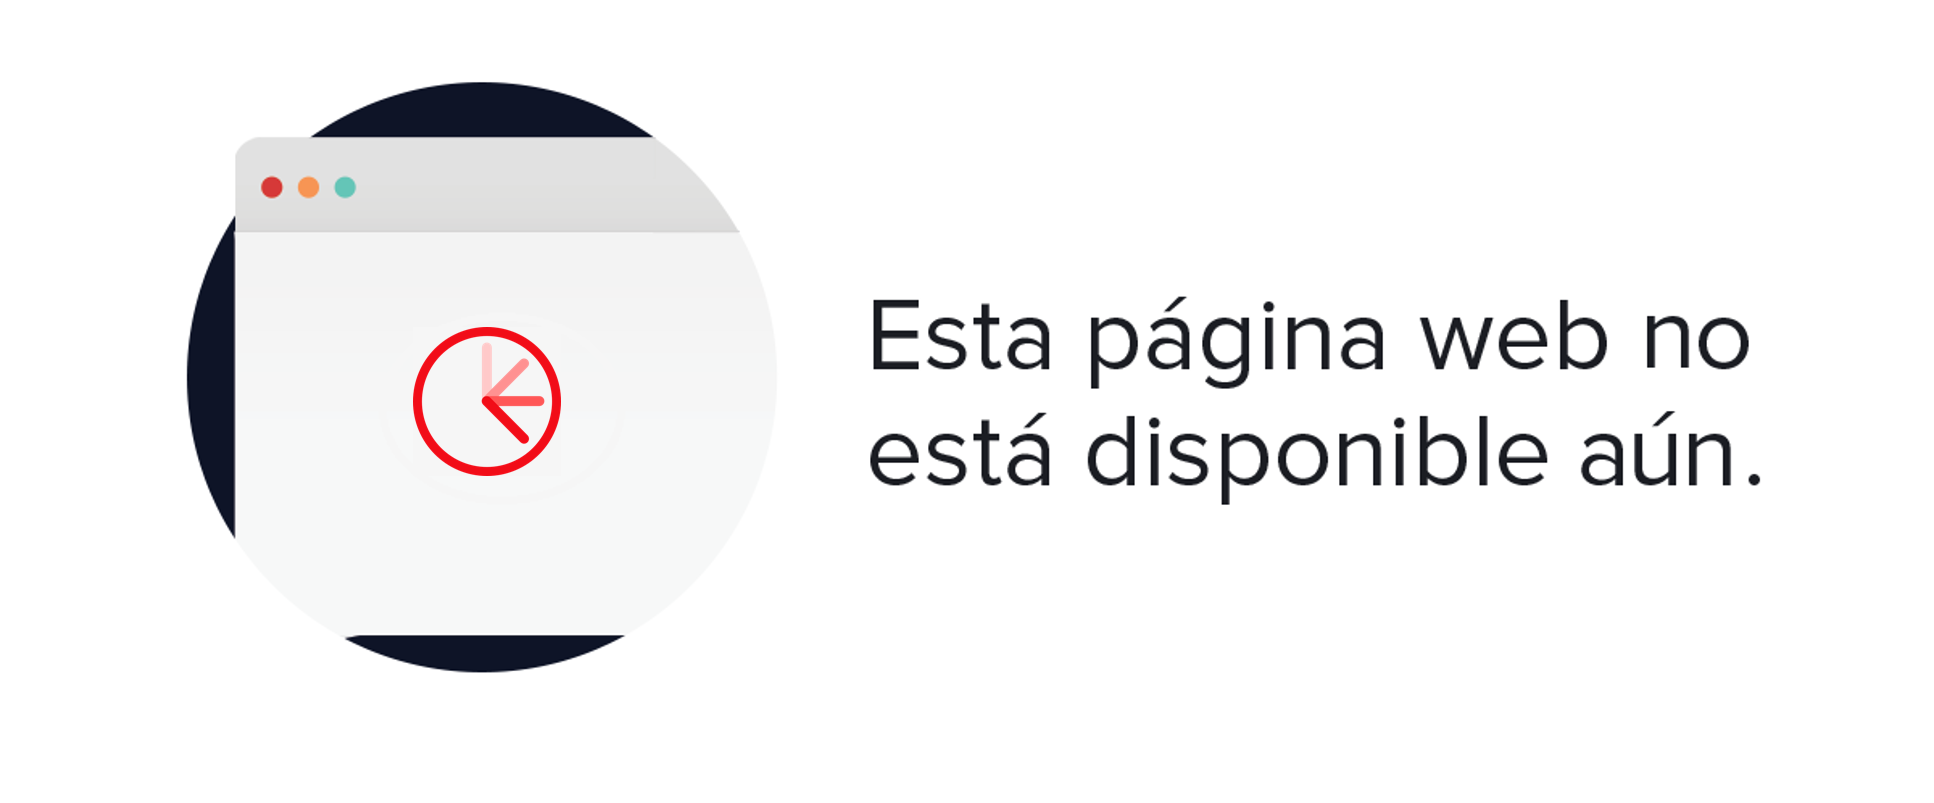 OXXO - Leggins de mujer OXXO negro con estribo Negro 8681613031845 - JPWOEOU